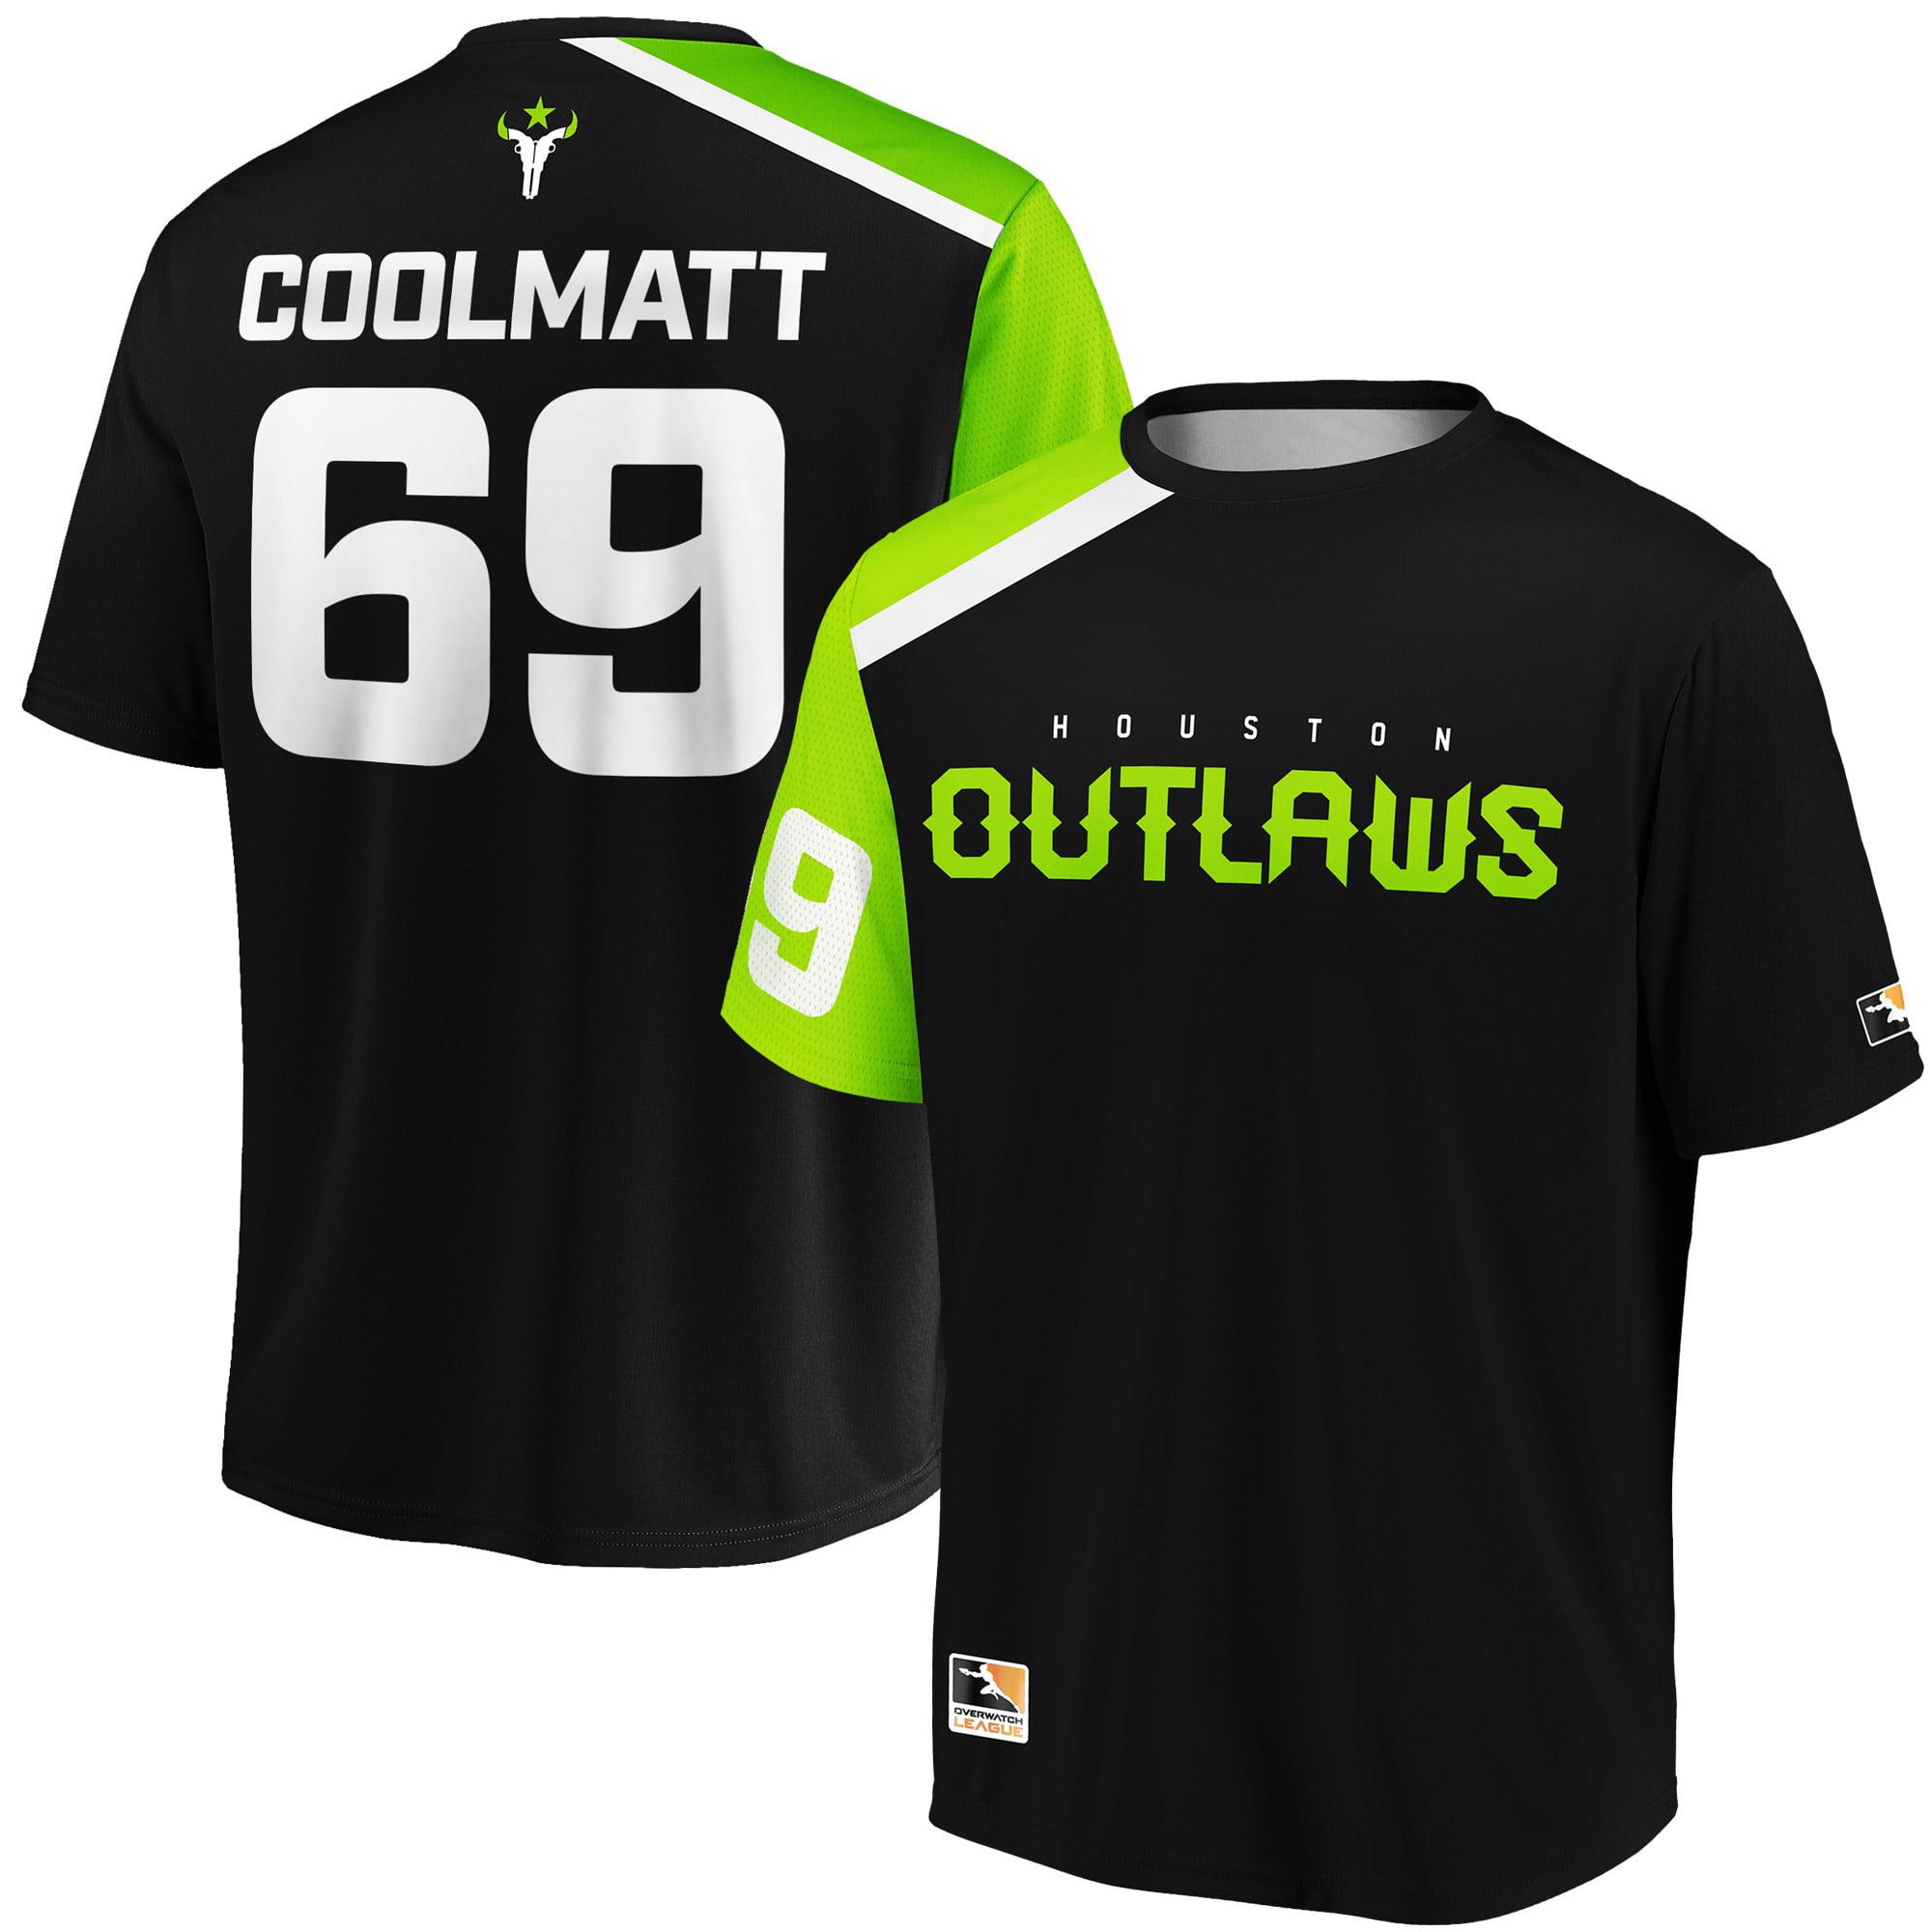 coolmatt Houston Outlaws Overwatch League Replica Home Jersey - Black